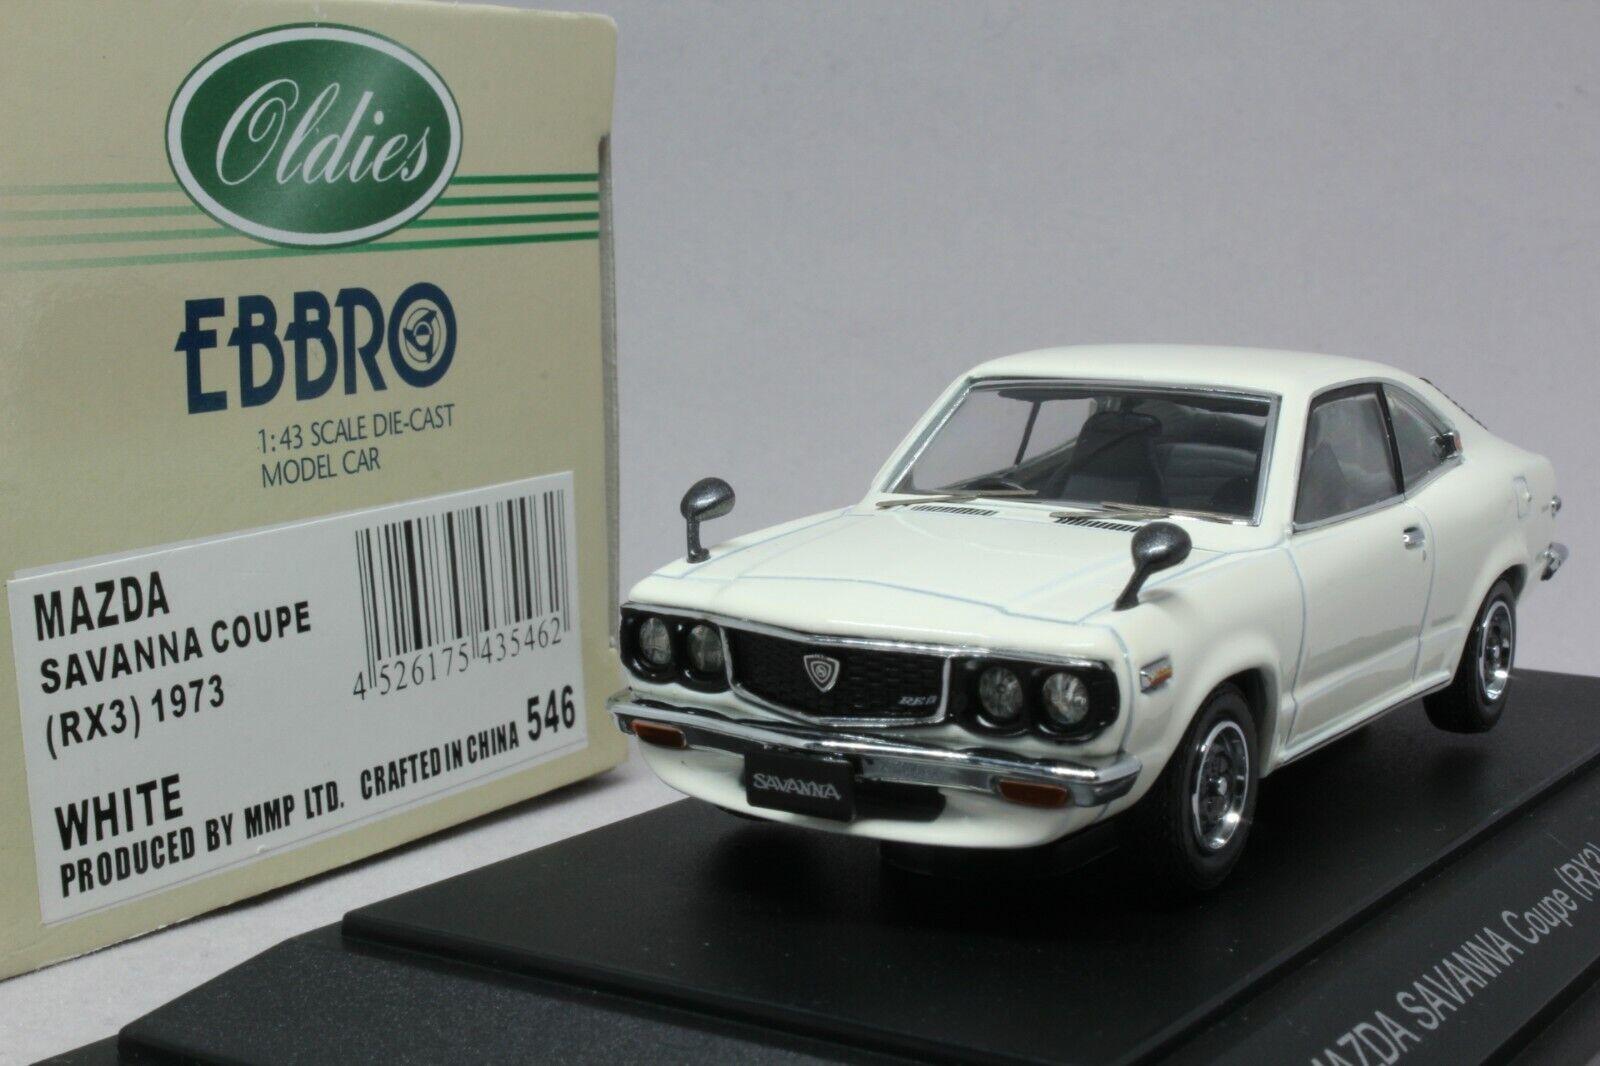 9224 EBBRO 1 43 MAZDA SAVANNA Coupe RX-3 RX3 blanc Comme neuf in box numéro de suivi